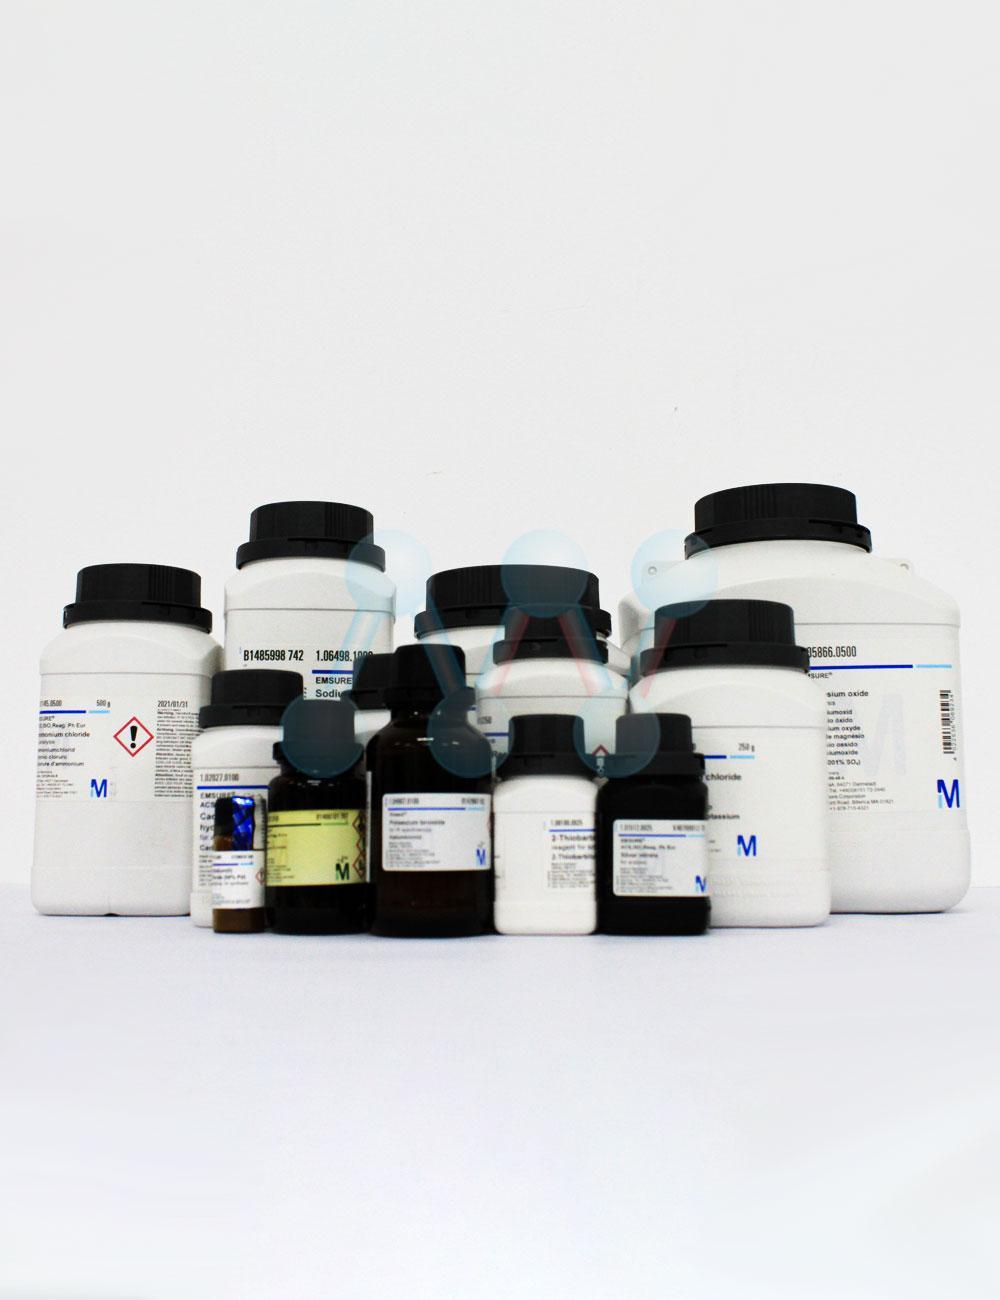 Sulfanilamide C6H8N2O2S PA